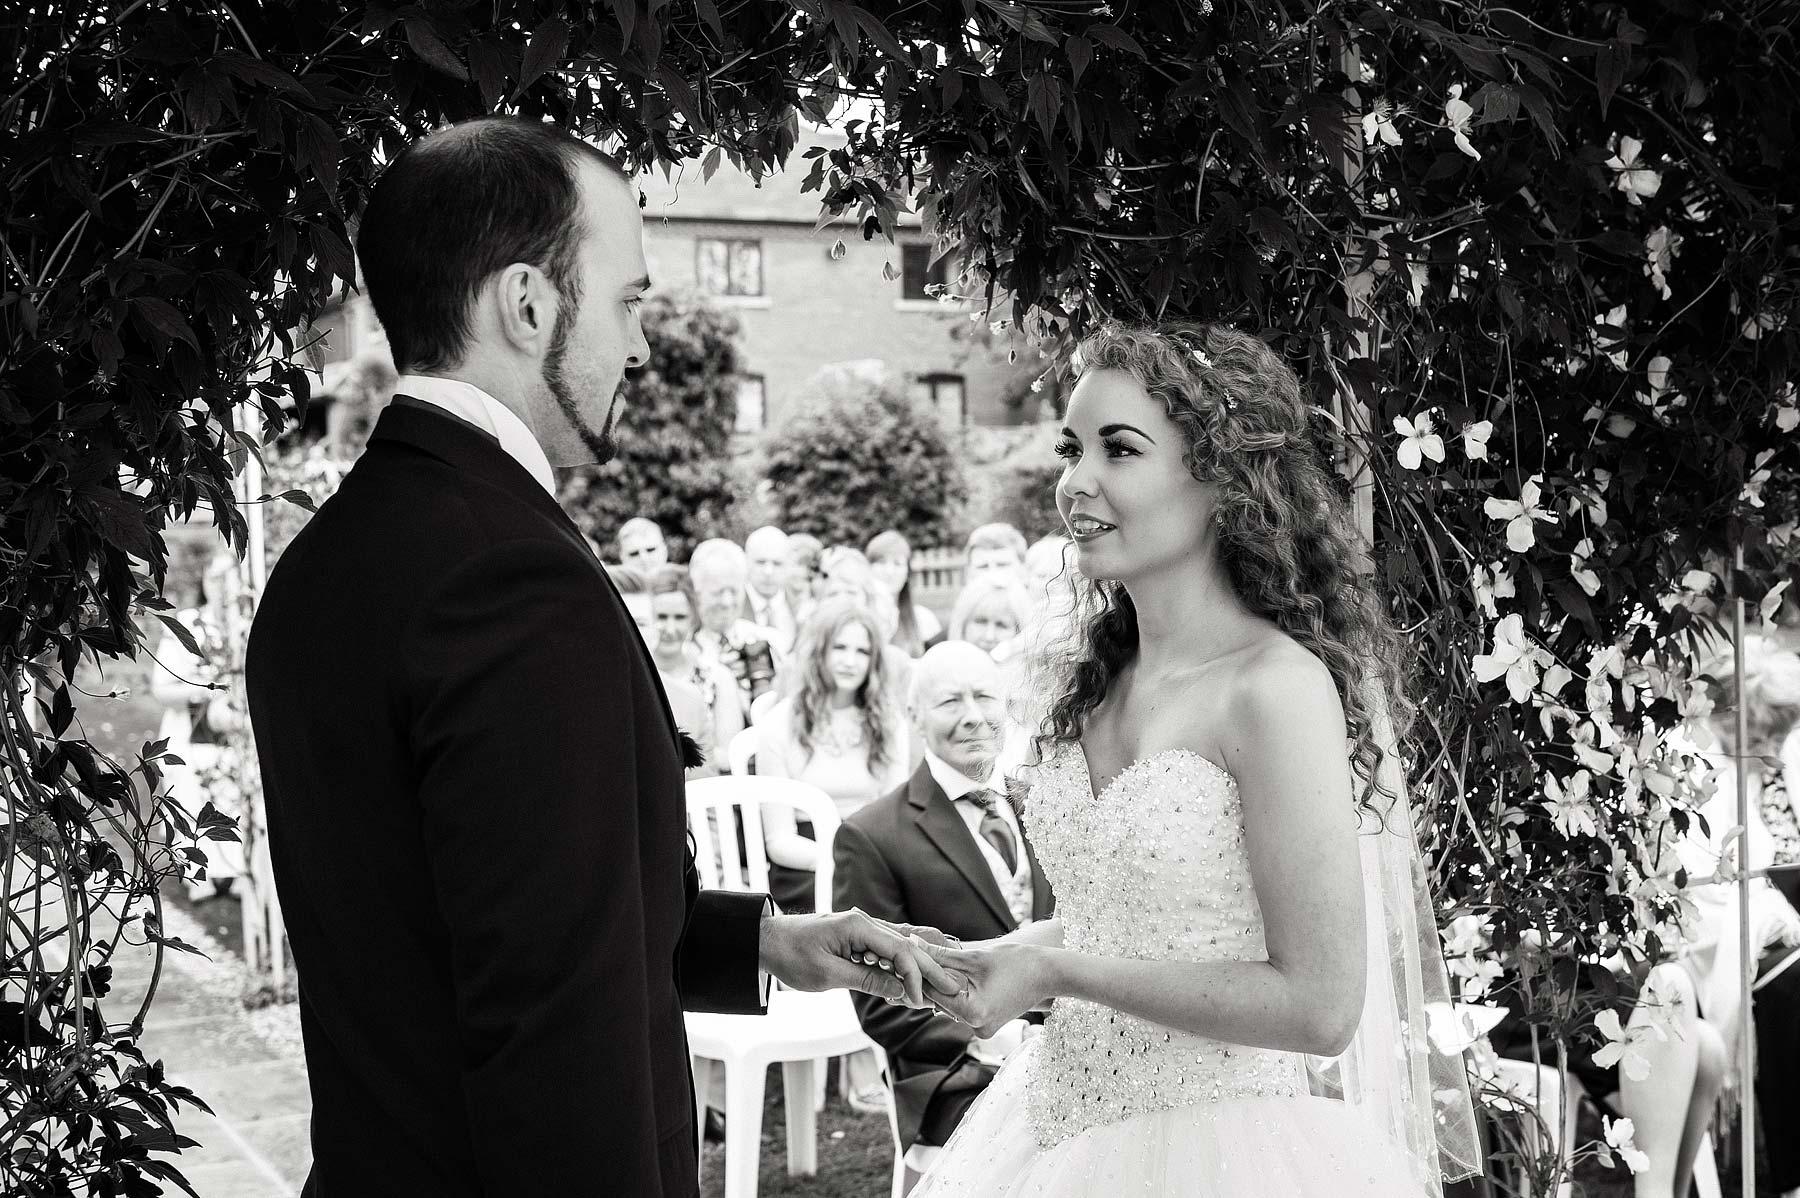 albright-hussey-manor-wedding-photographers-030